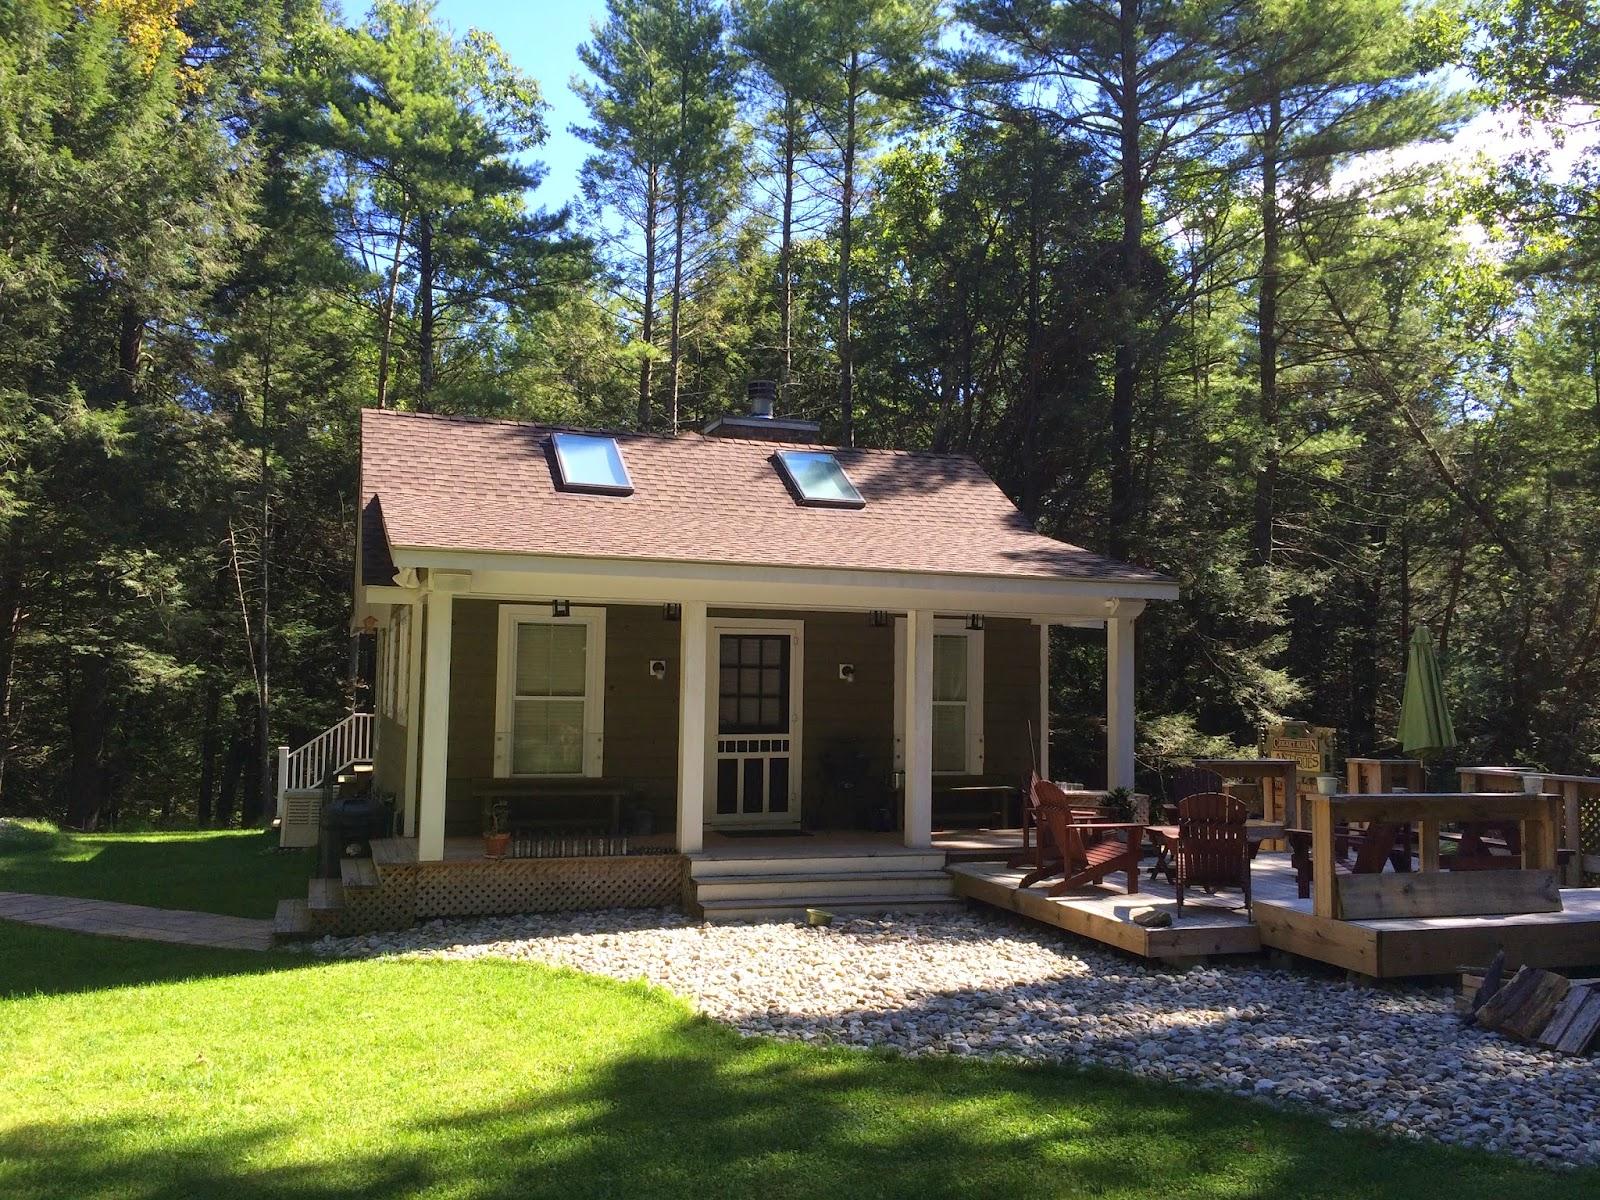 att vacation rental catskills ideas of cabins bungalow wilde community design rentals interior photo cabin new york glen x